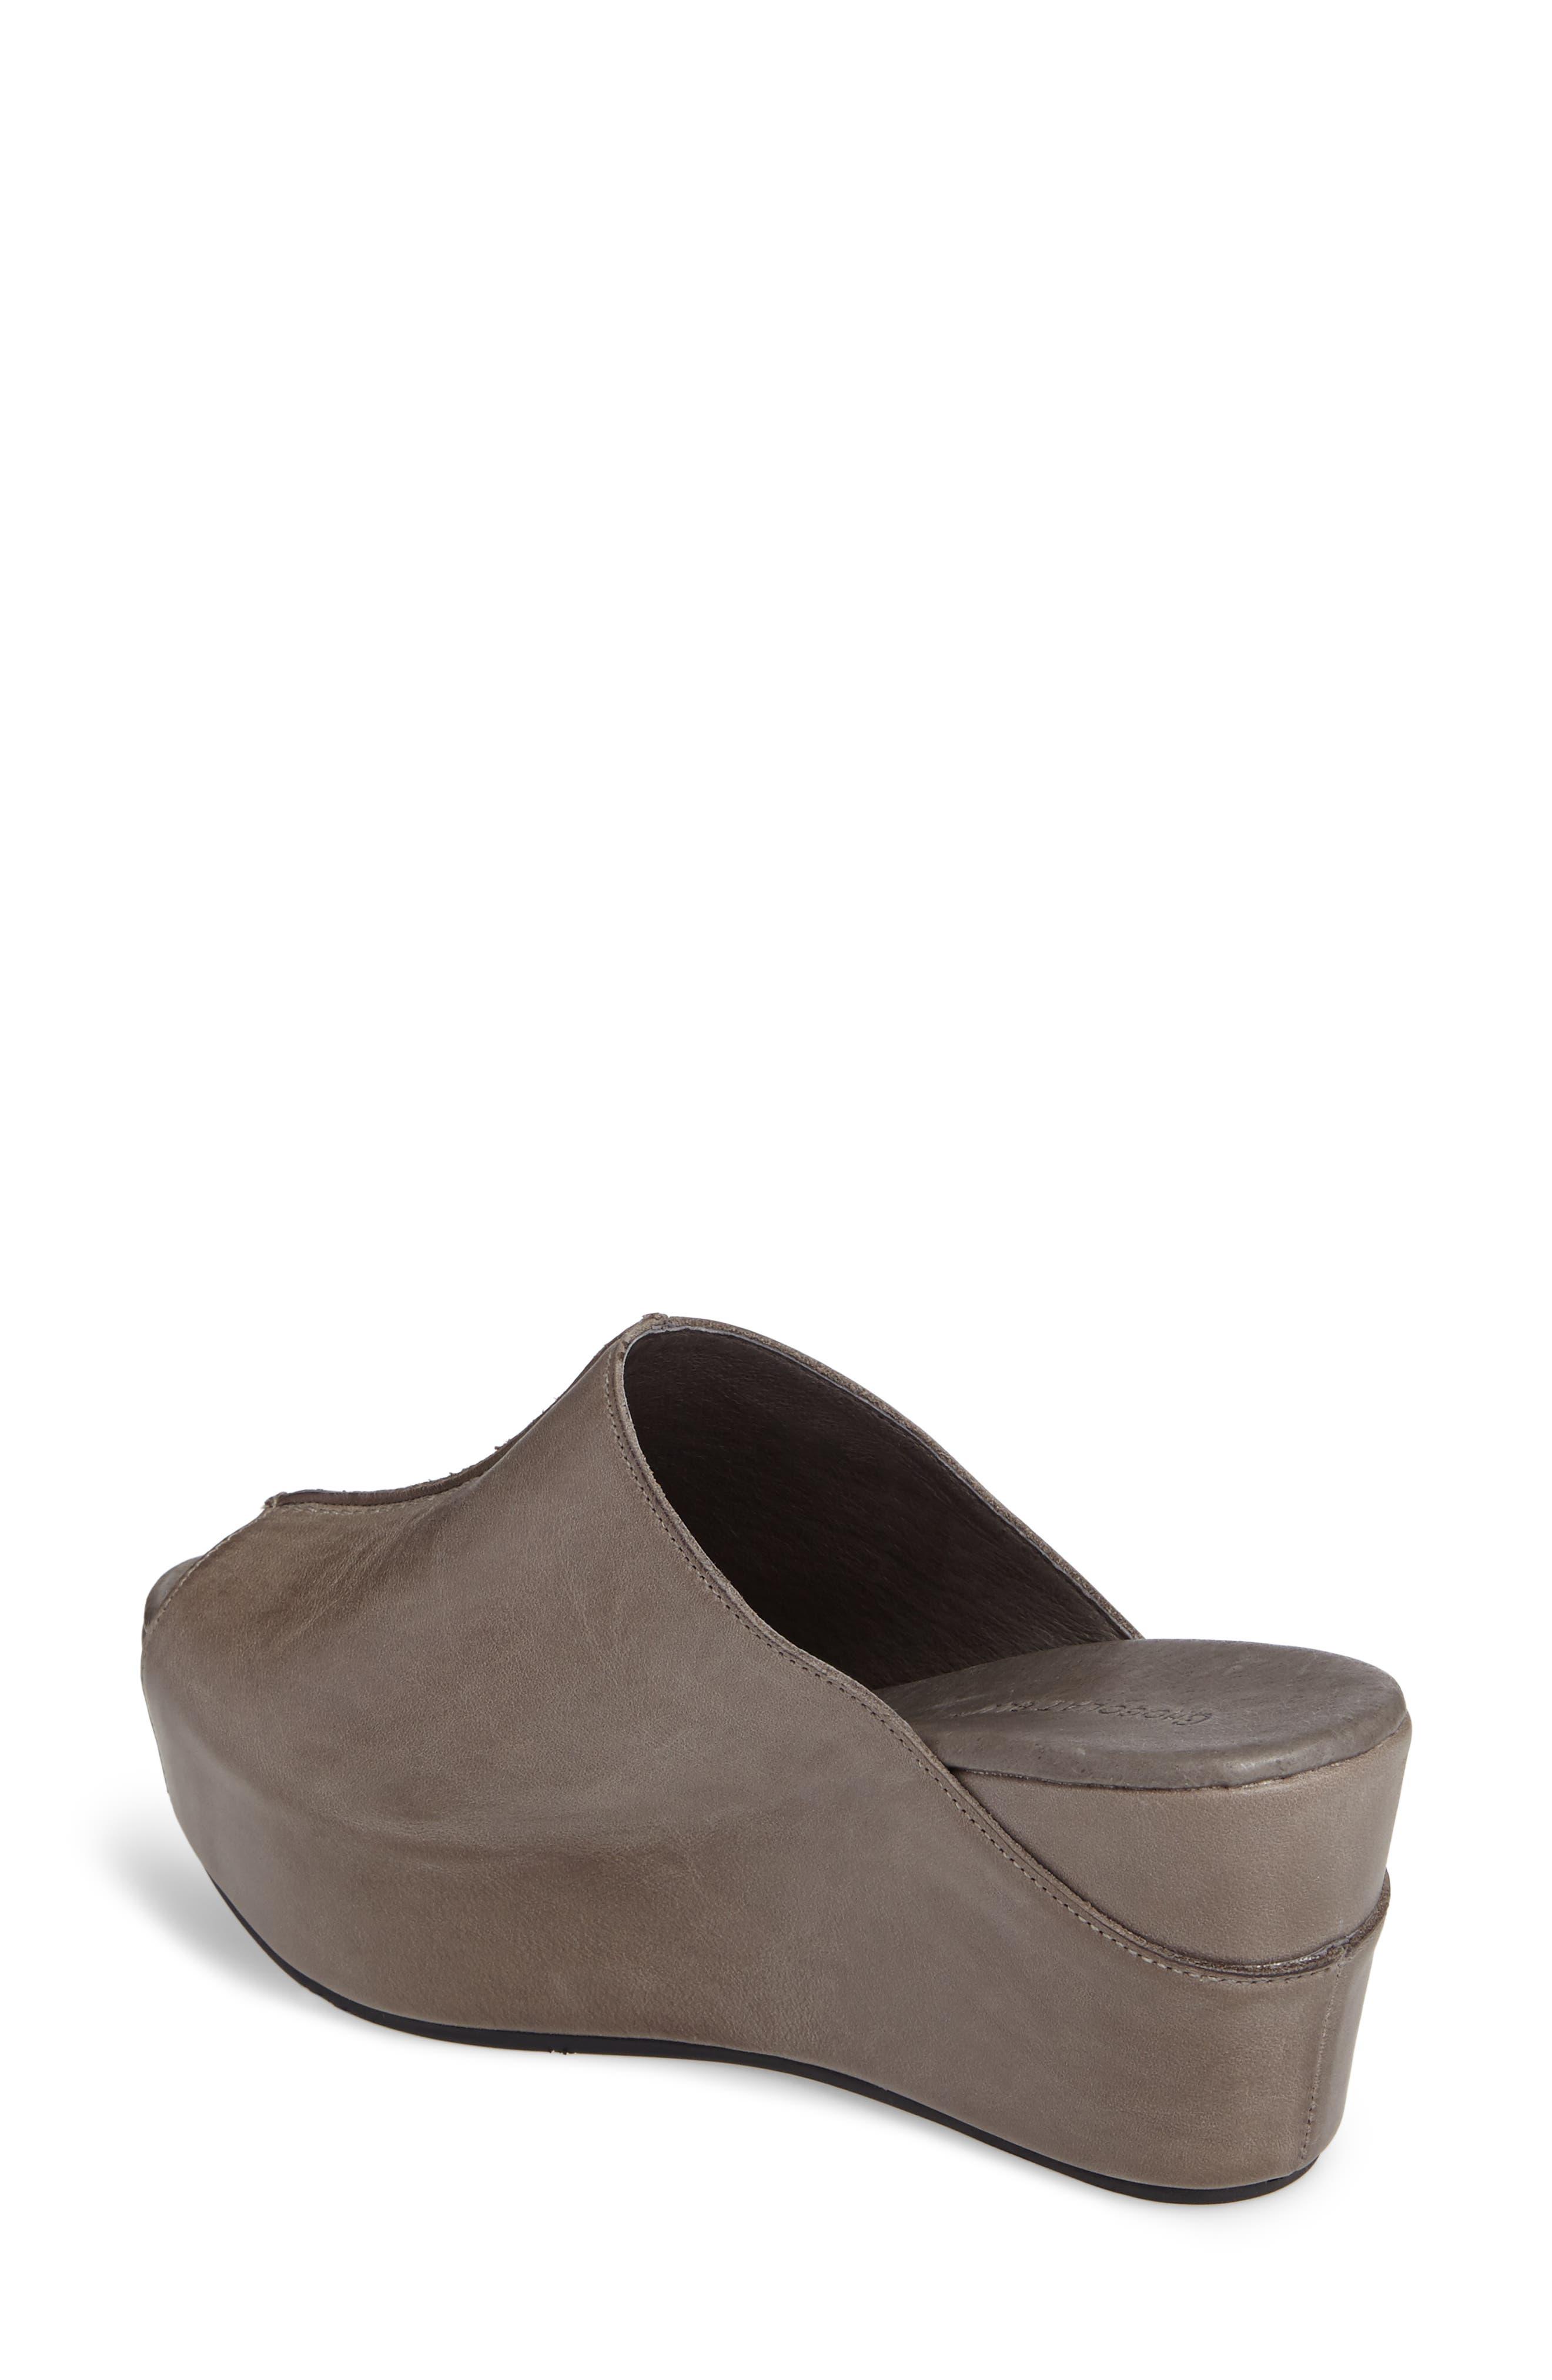 Wynn Peep Toe Mule,                             Alternate thumbnail 2, color,                             Graphite Leather